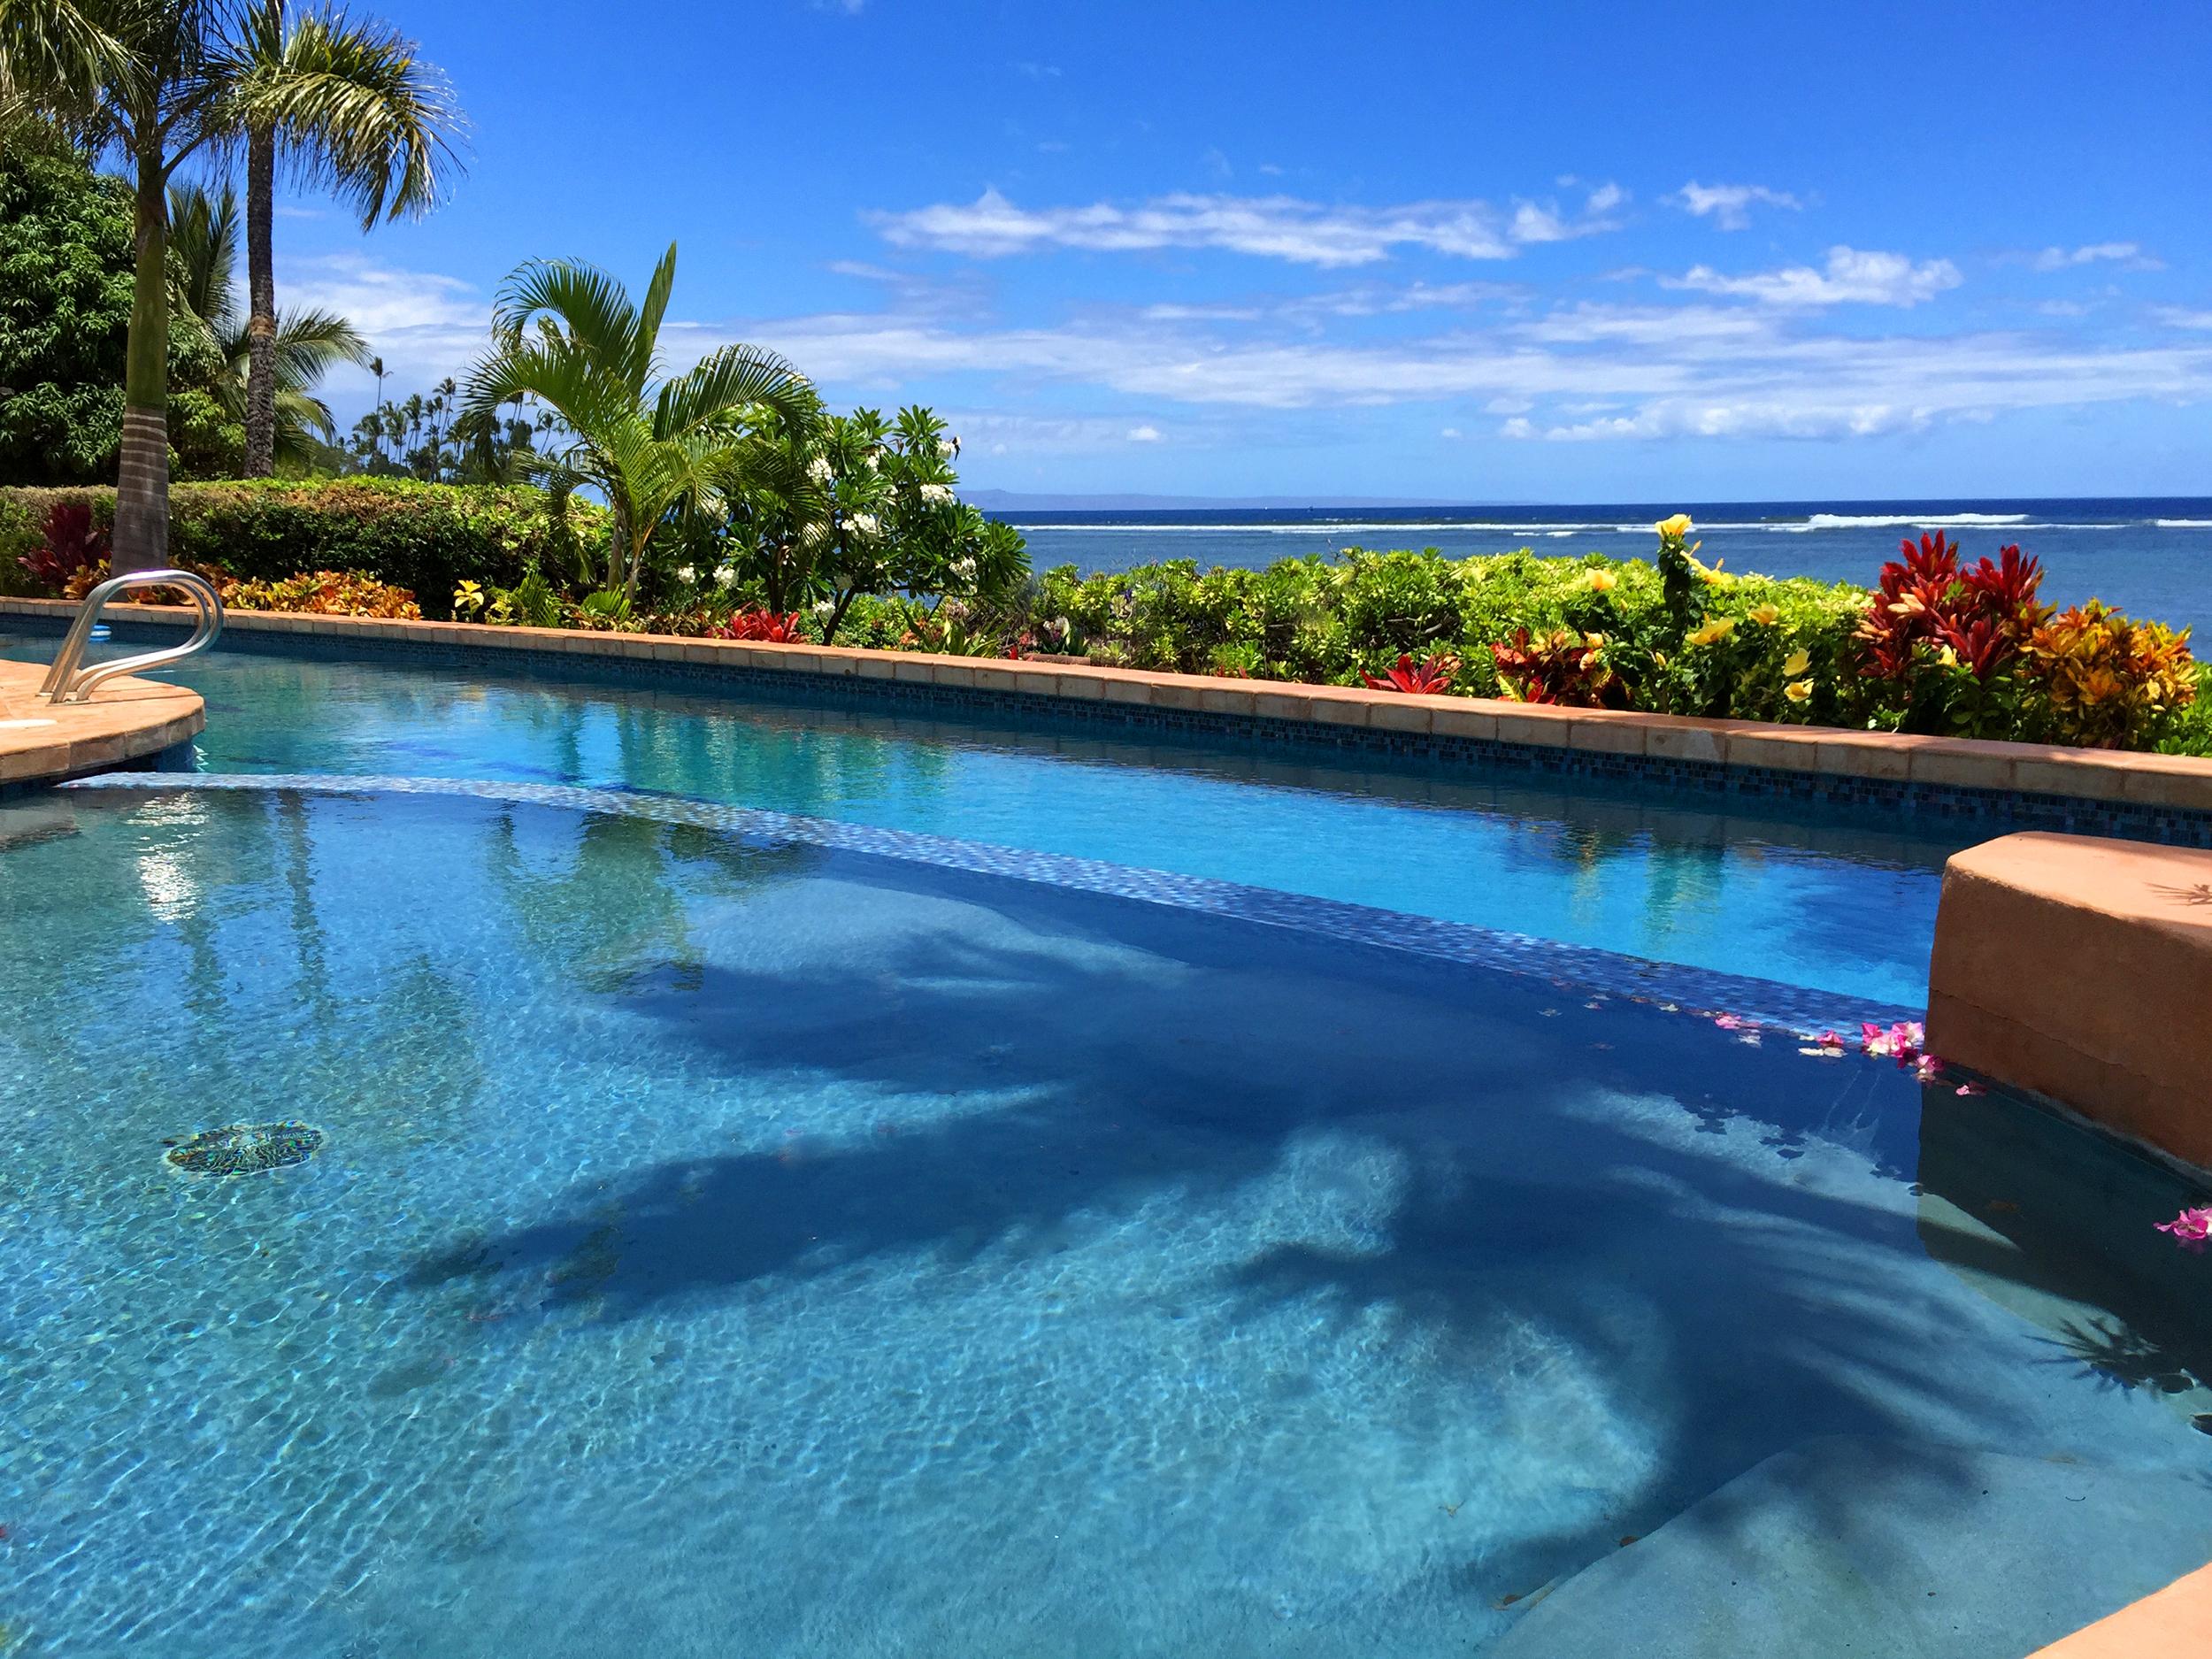 pool near ocean Blue Sky Villa Maui